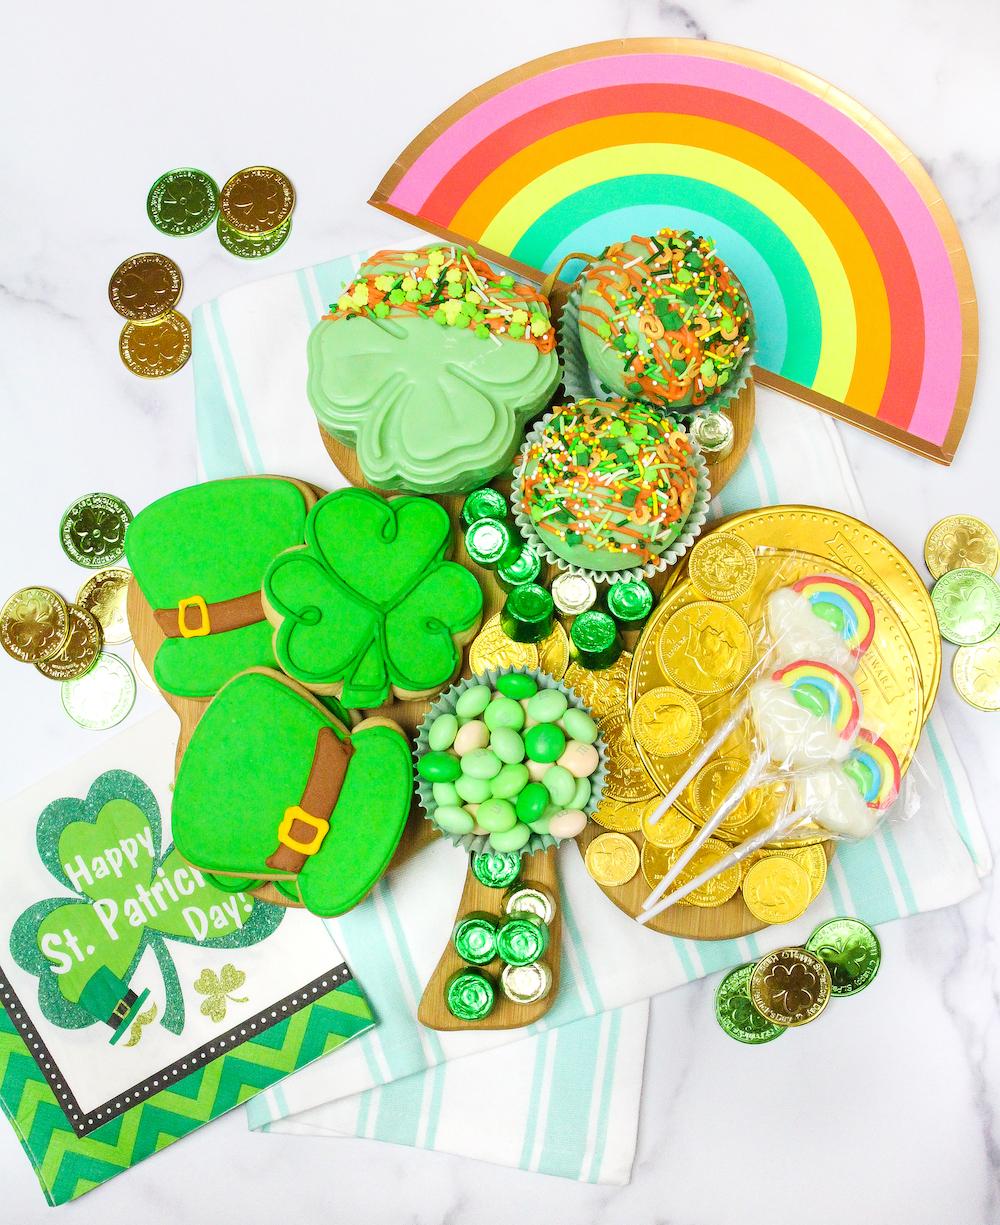 Saint Patrick's Day Treat Board Flat Lay